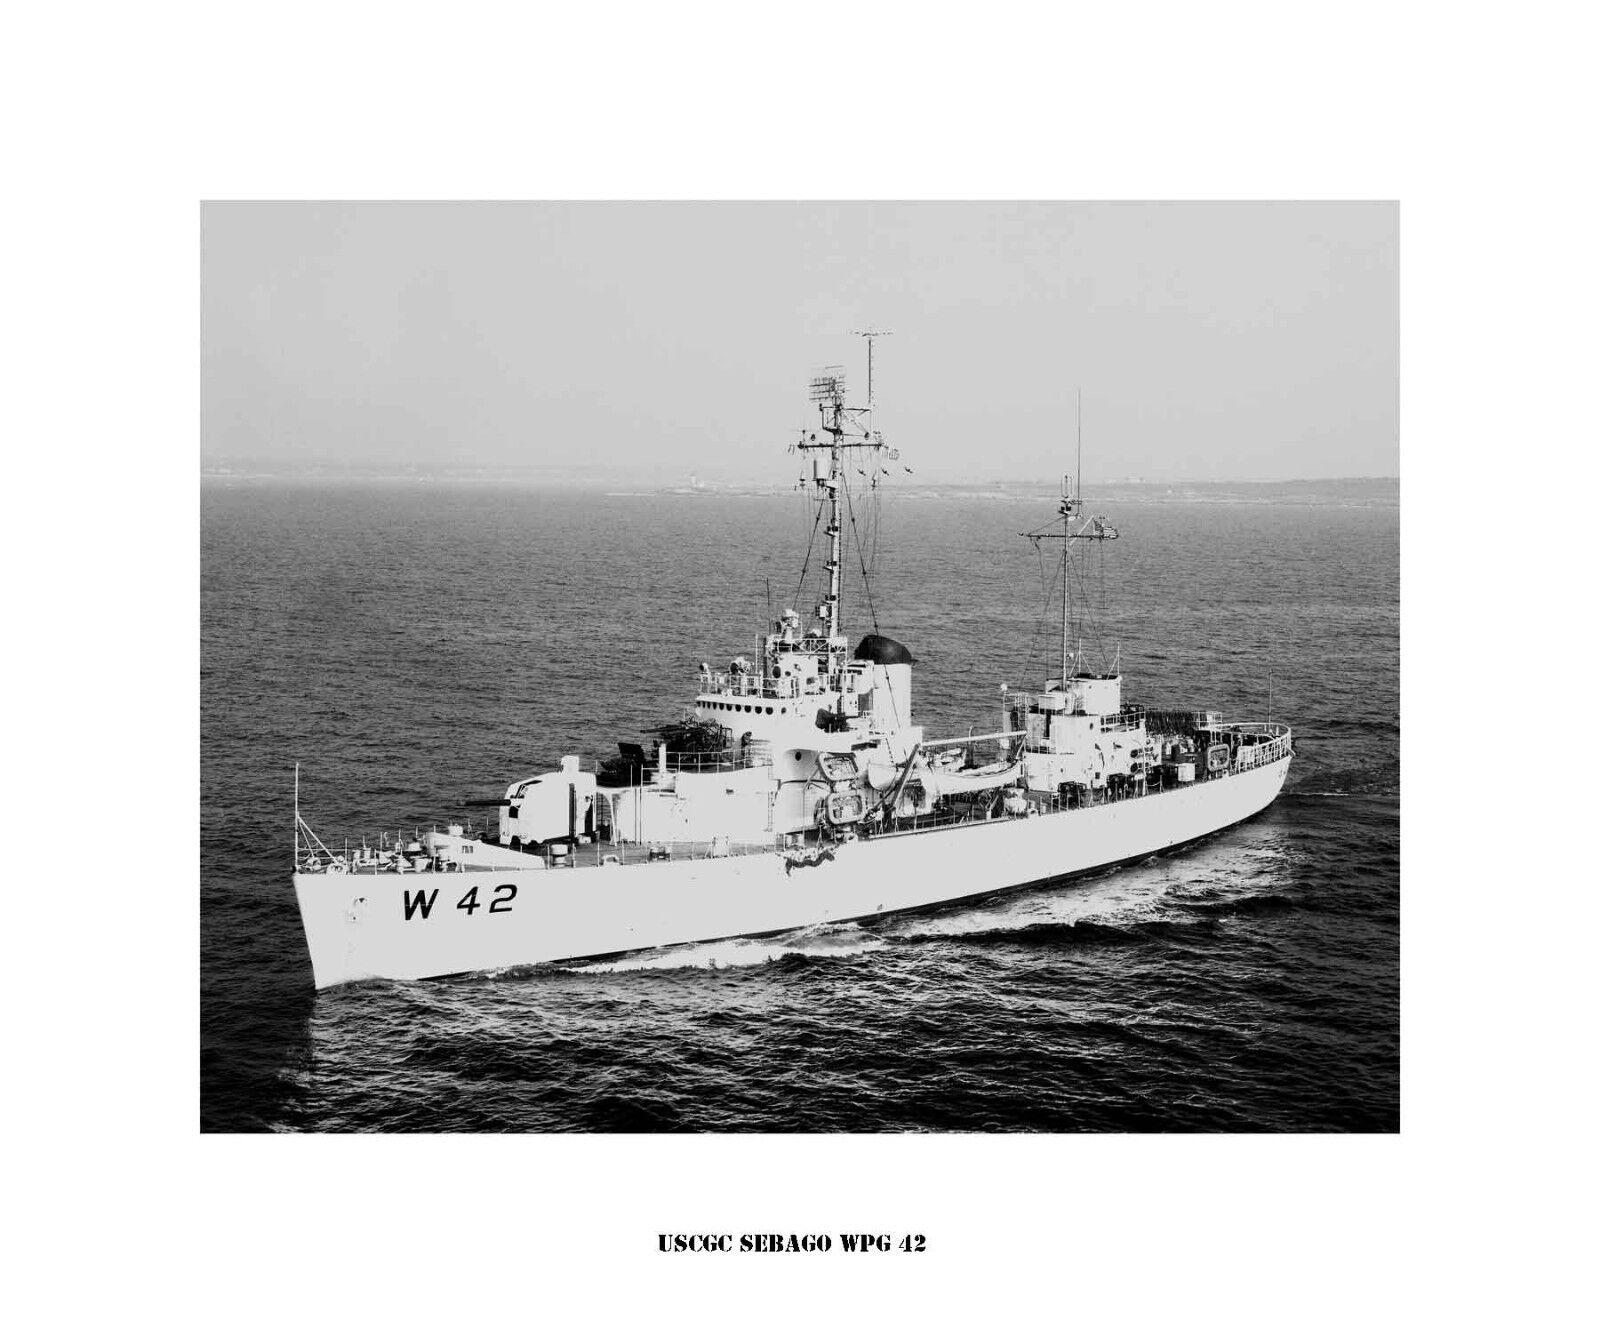 USCGC Sebago WPG 42 ---USCG, United States Coast Guard Ship Photo Drucken